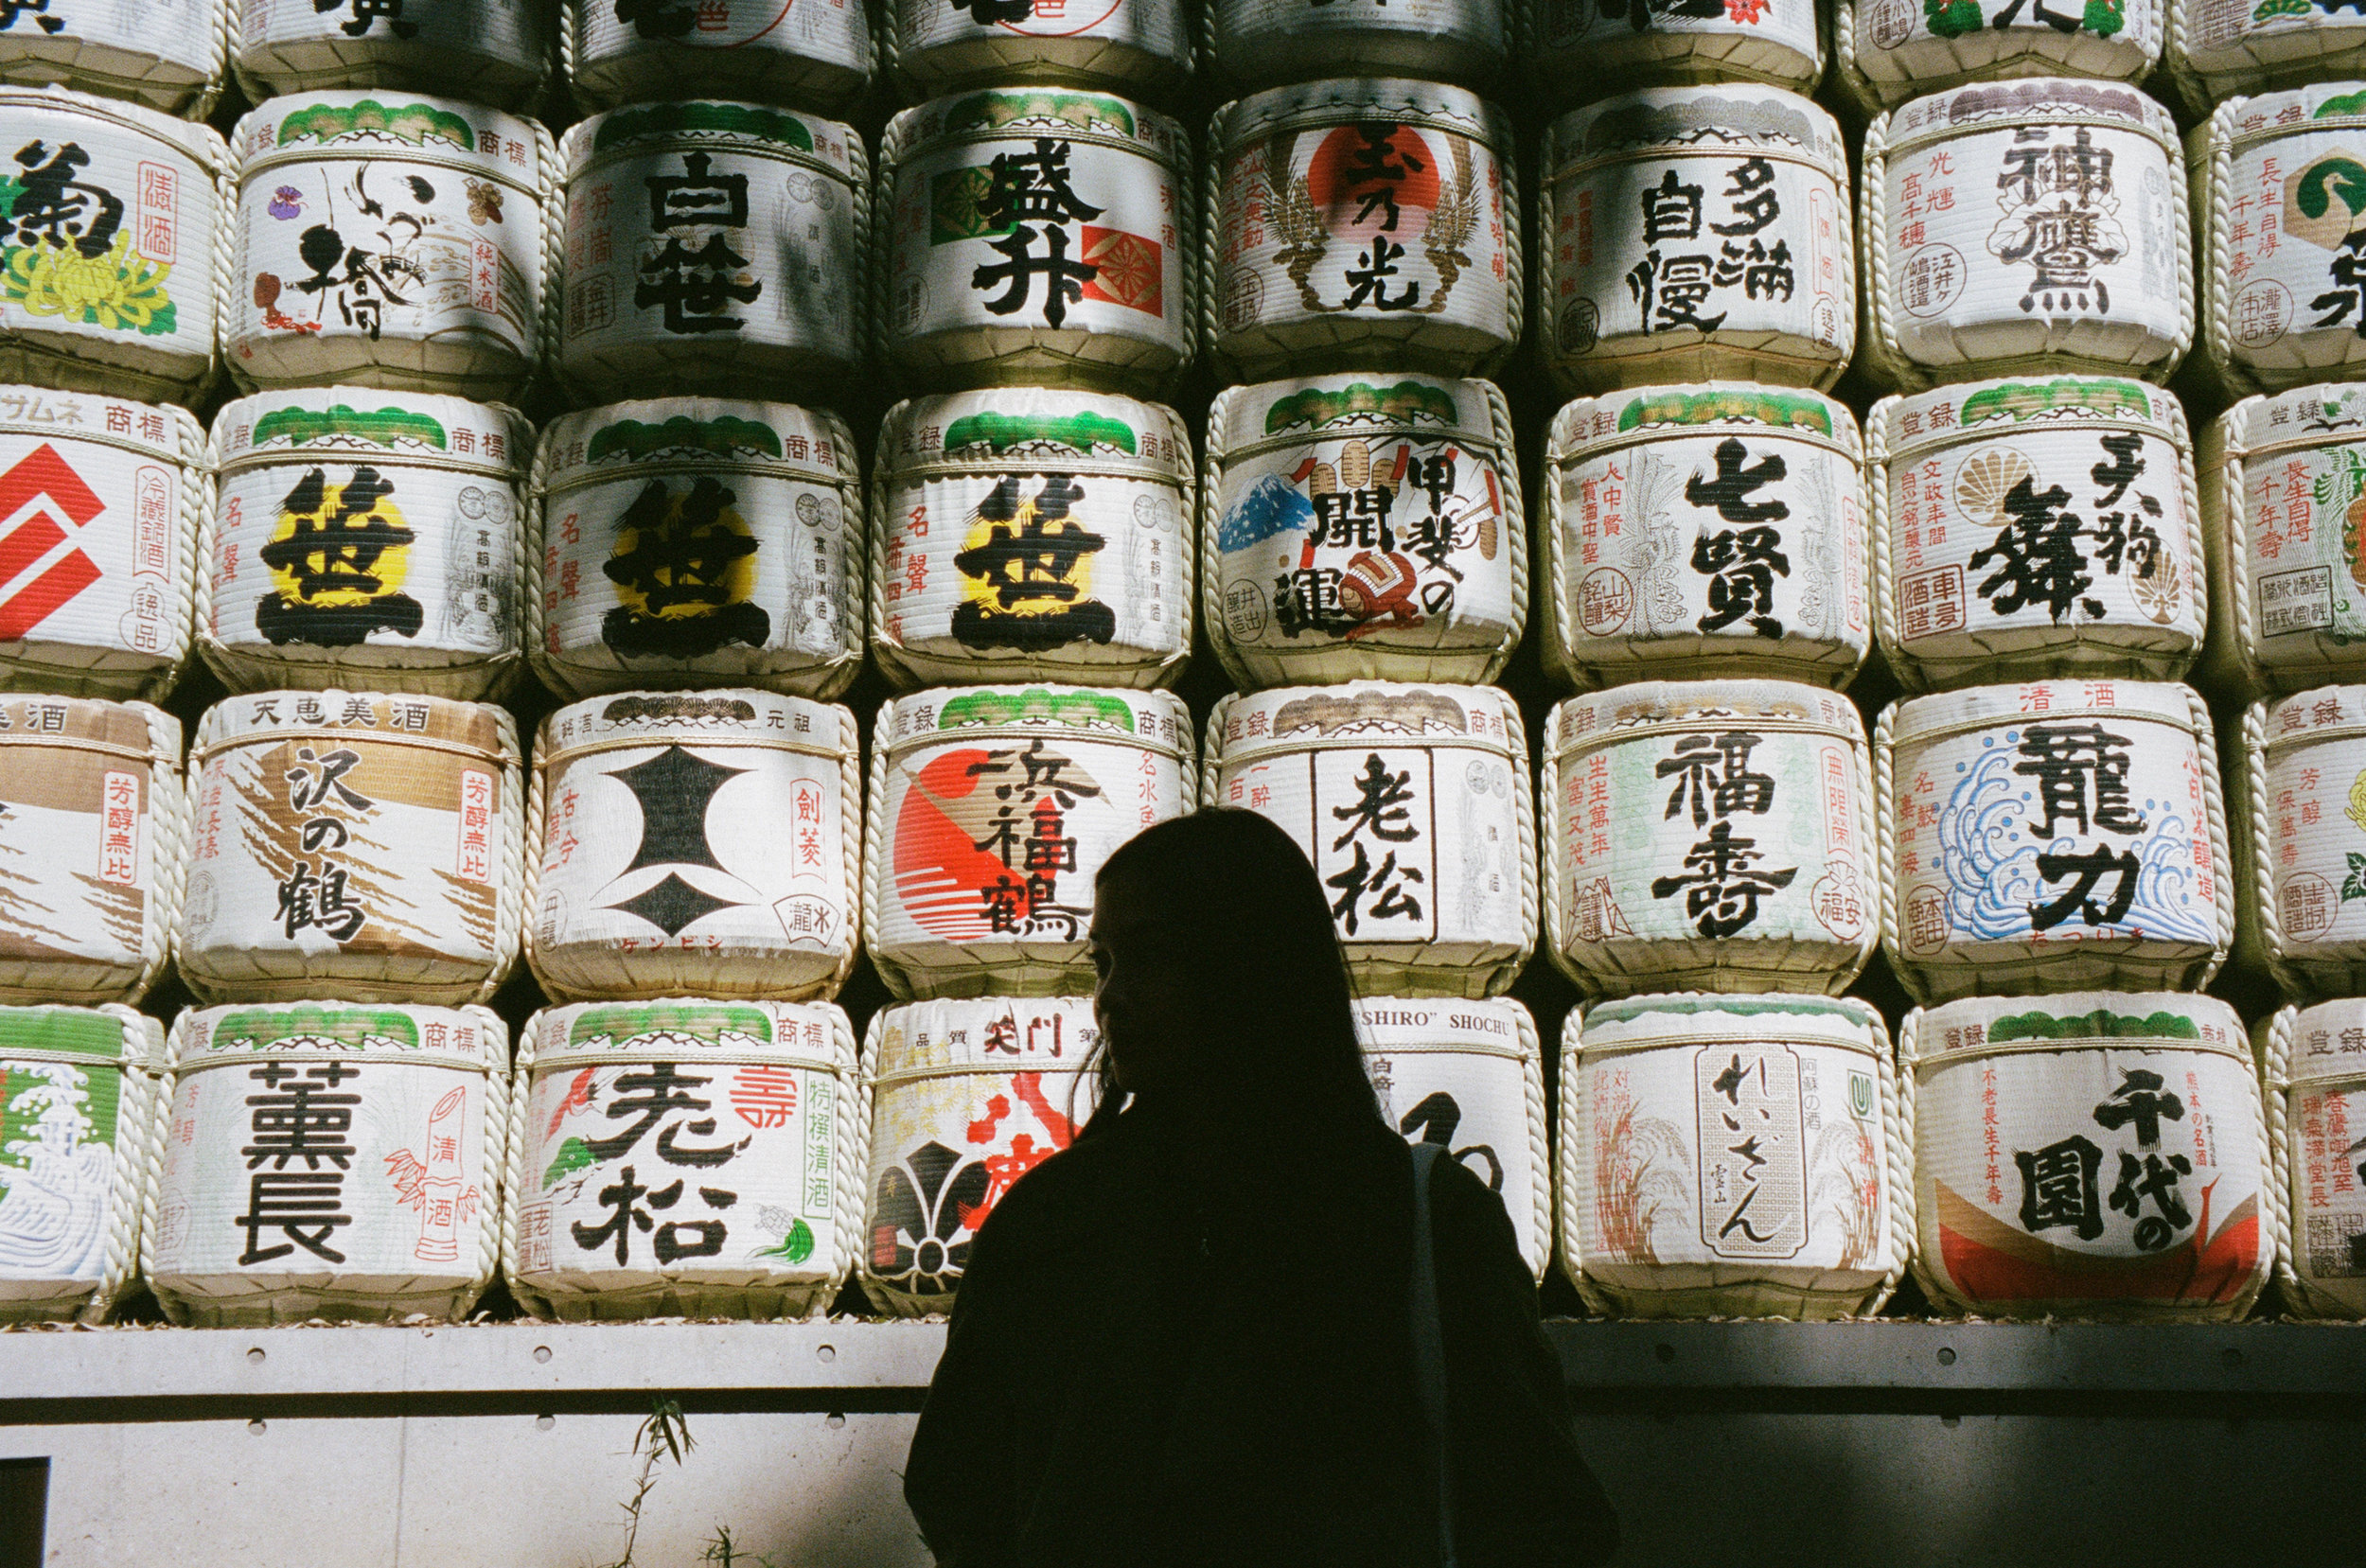 Japan_35mm-48.jpg